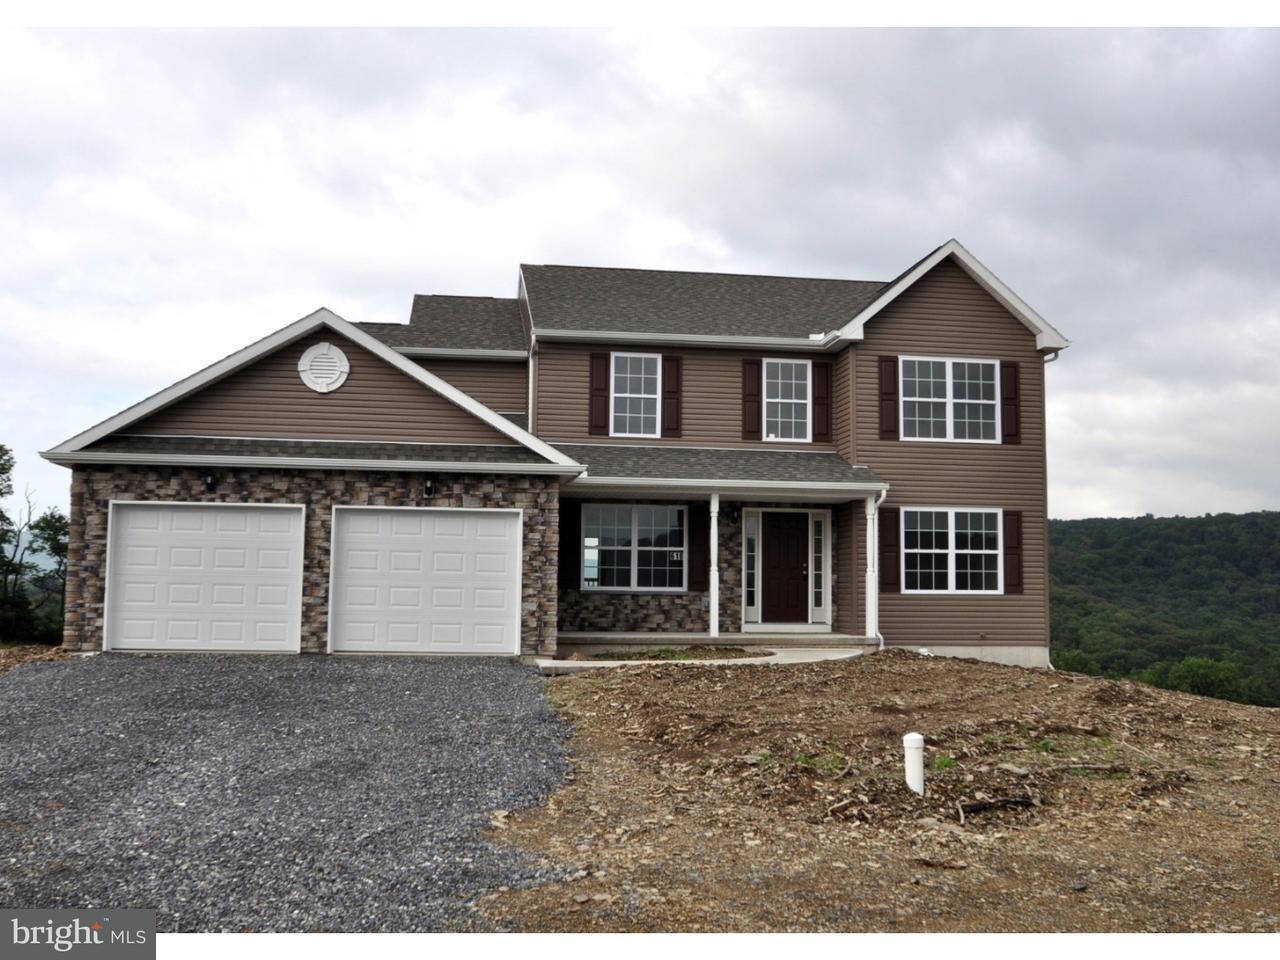 Single Family Home for Sale at 618 KENSINGTON Circle Walnutport, Pennsylvania 18088 United States